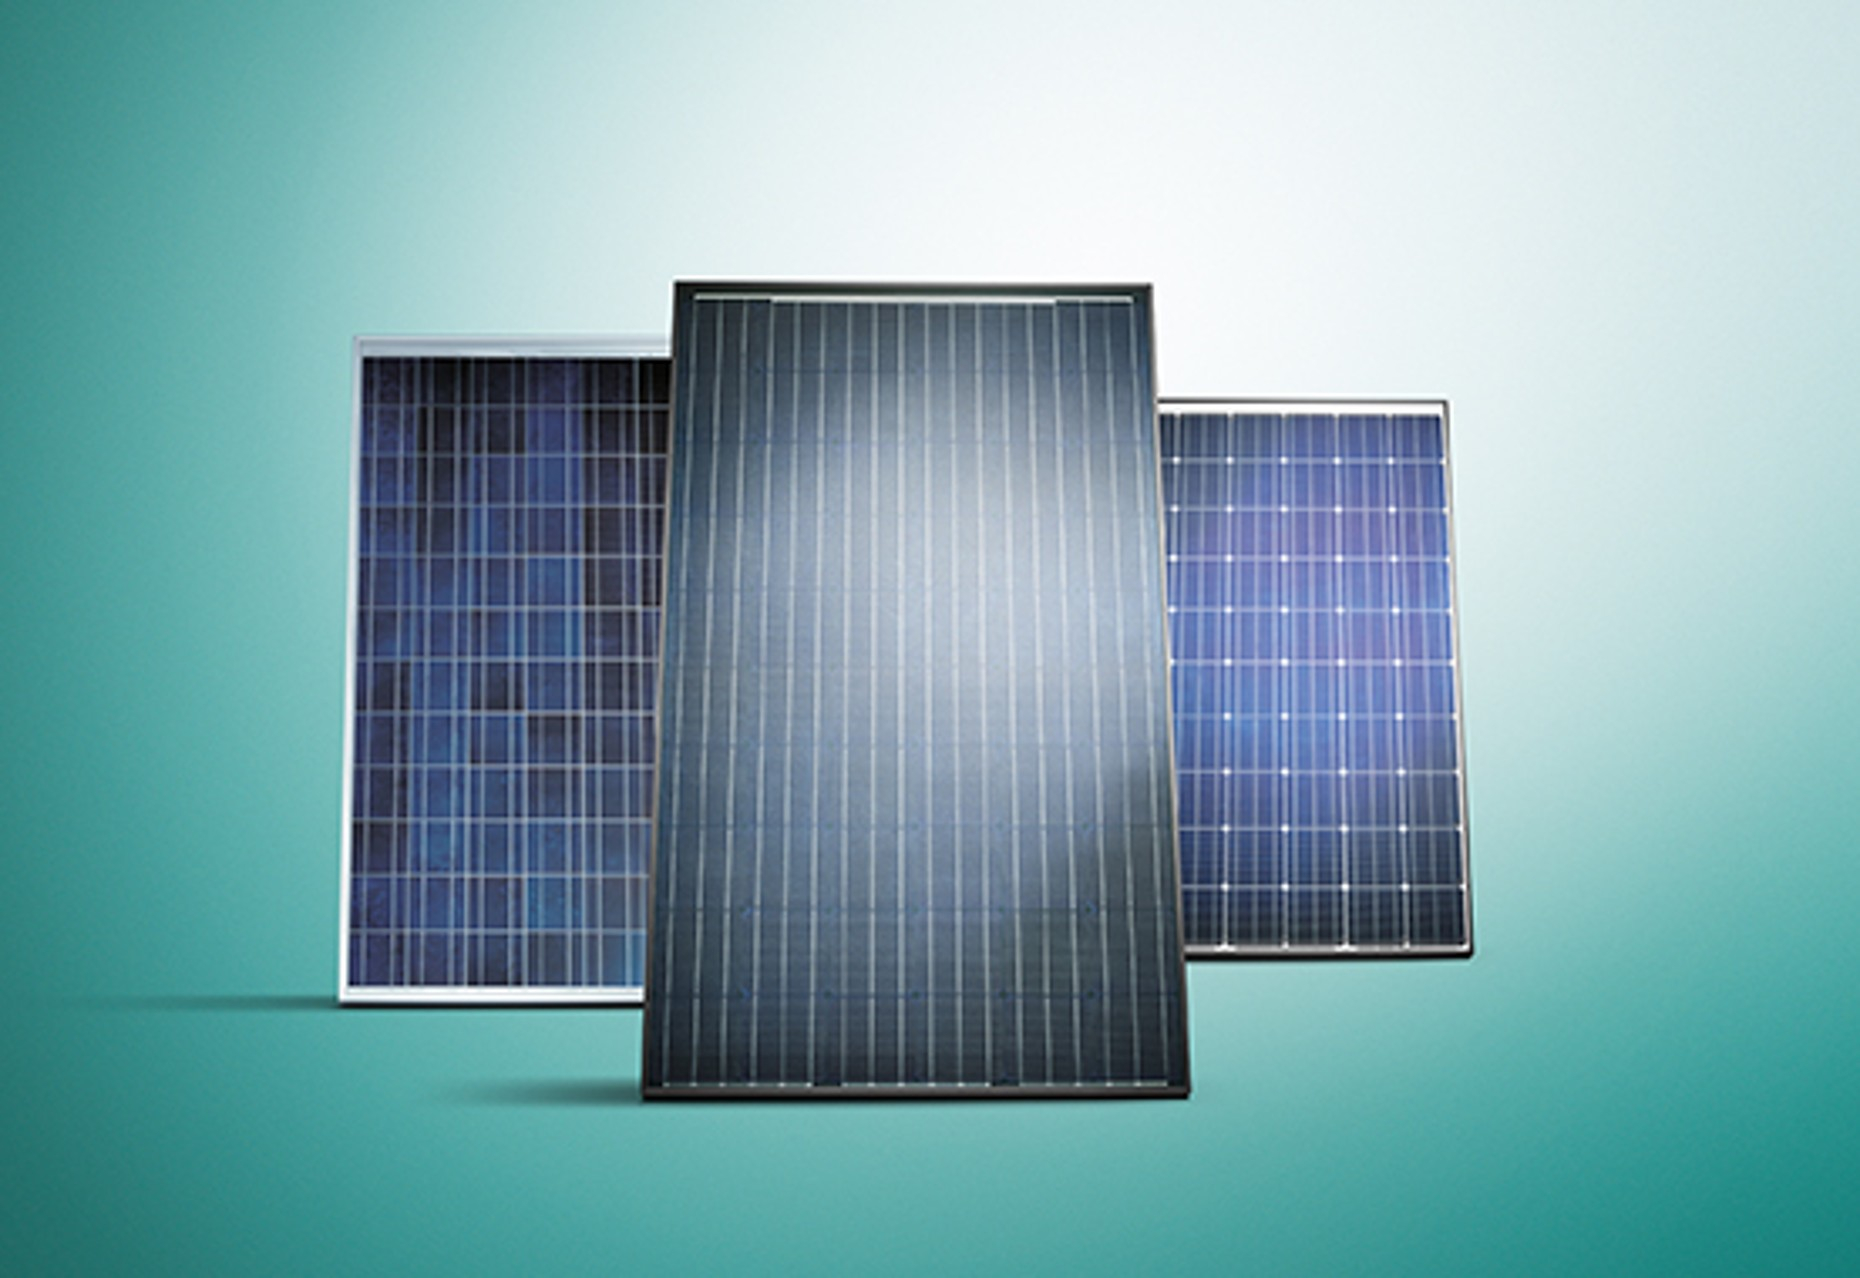 Vaillant zonne energie   Van CleynenBreugel Bart bv